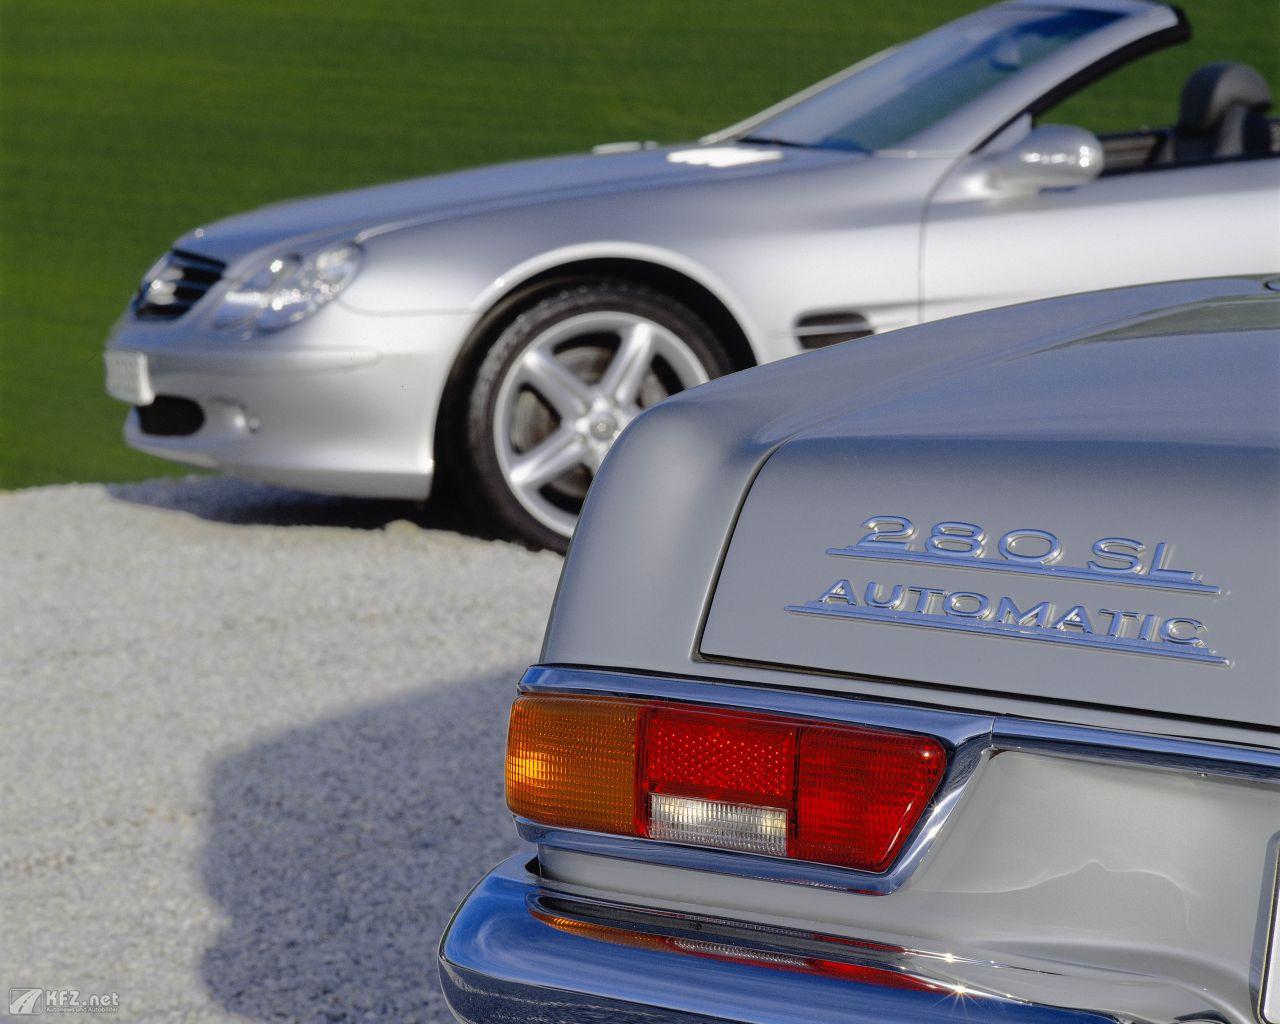 mercedes-sl-klasse-1280x1024-5